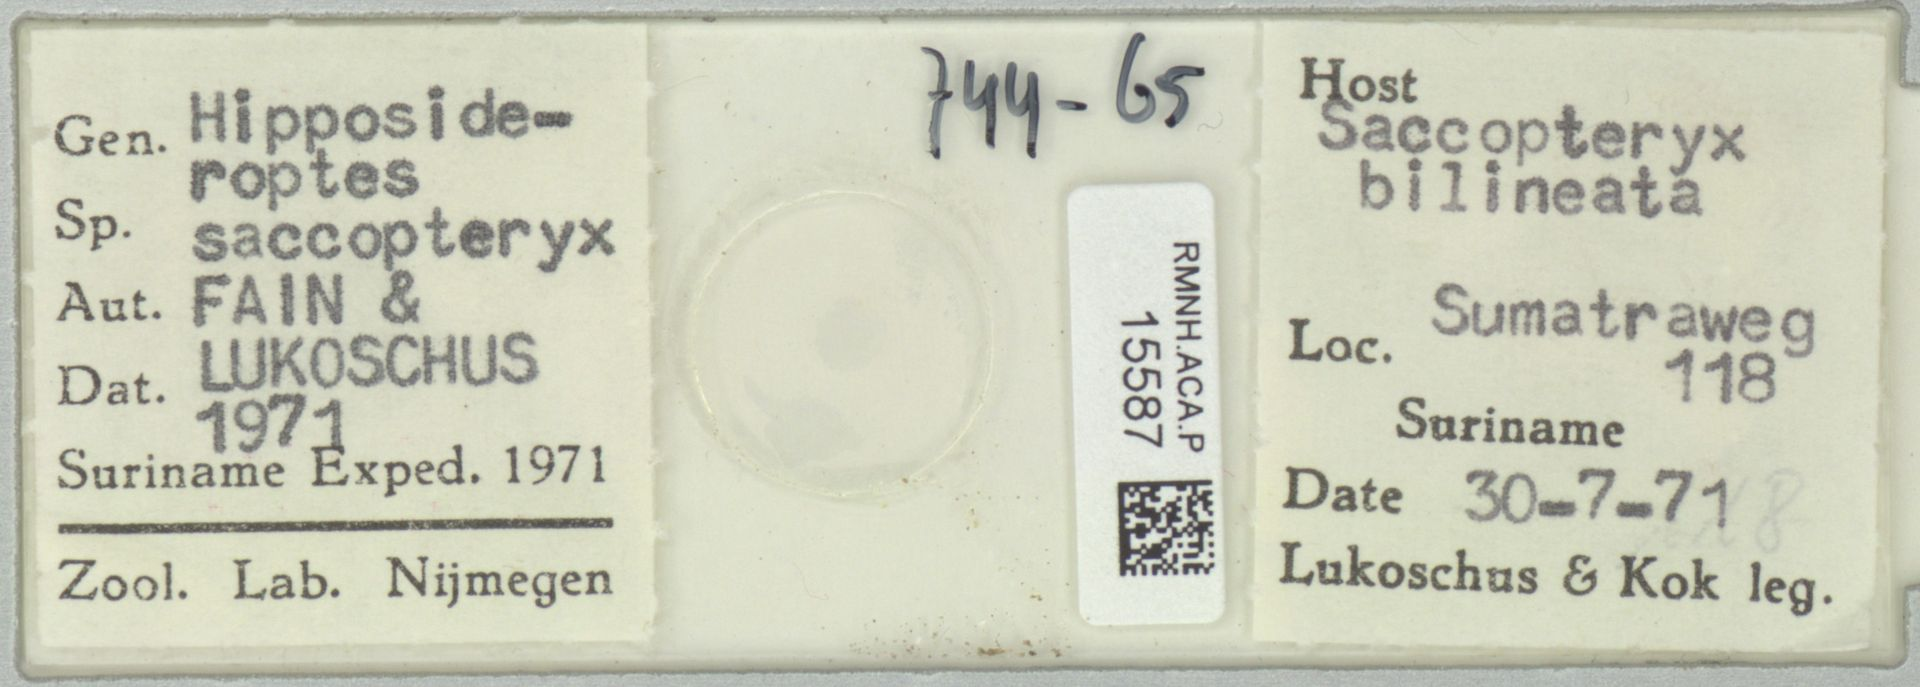 RMNH.ACA.P.15587 | Hipposideroptes saccopteryx